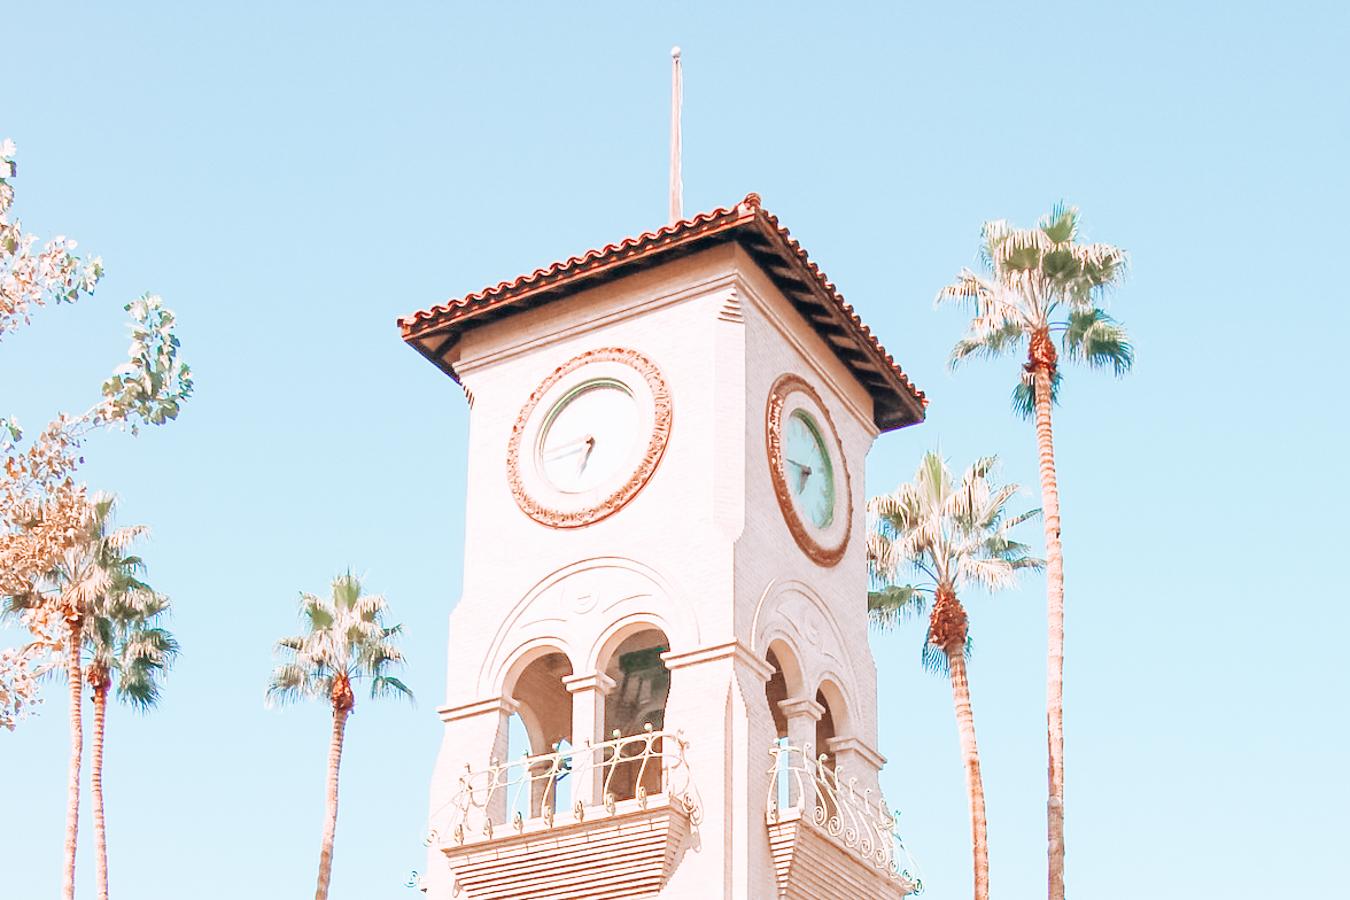 Clock tower in Bakersfield